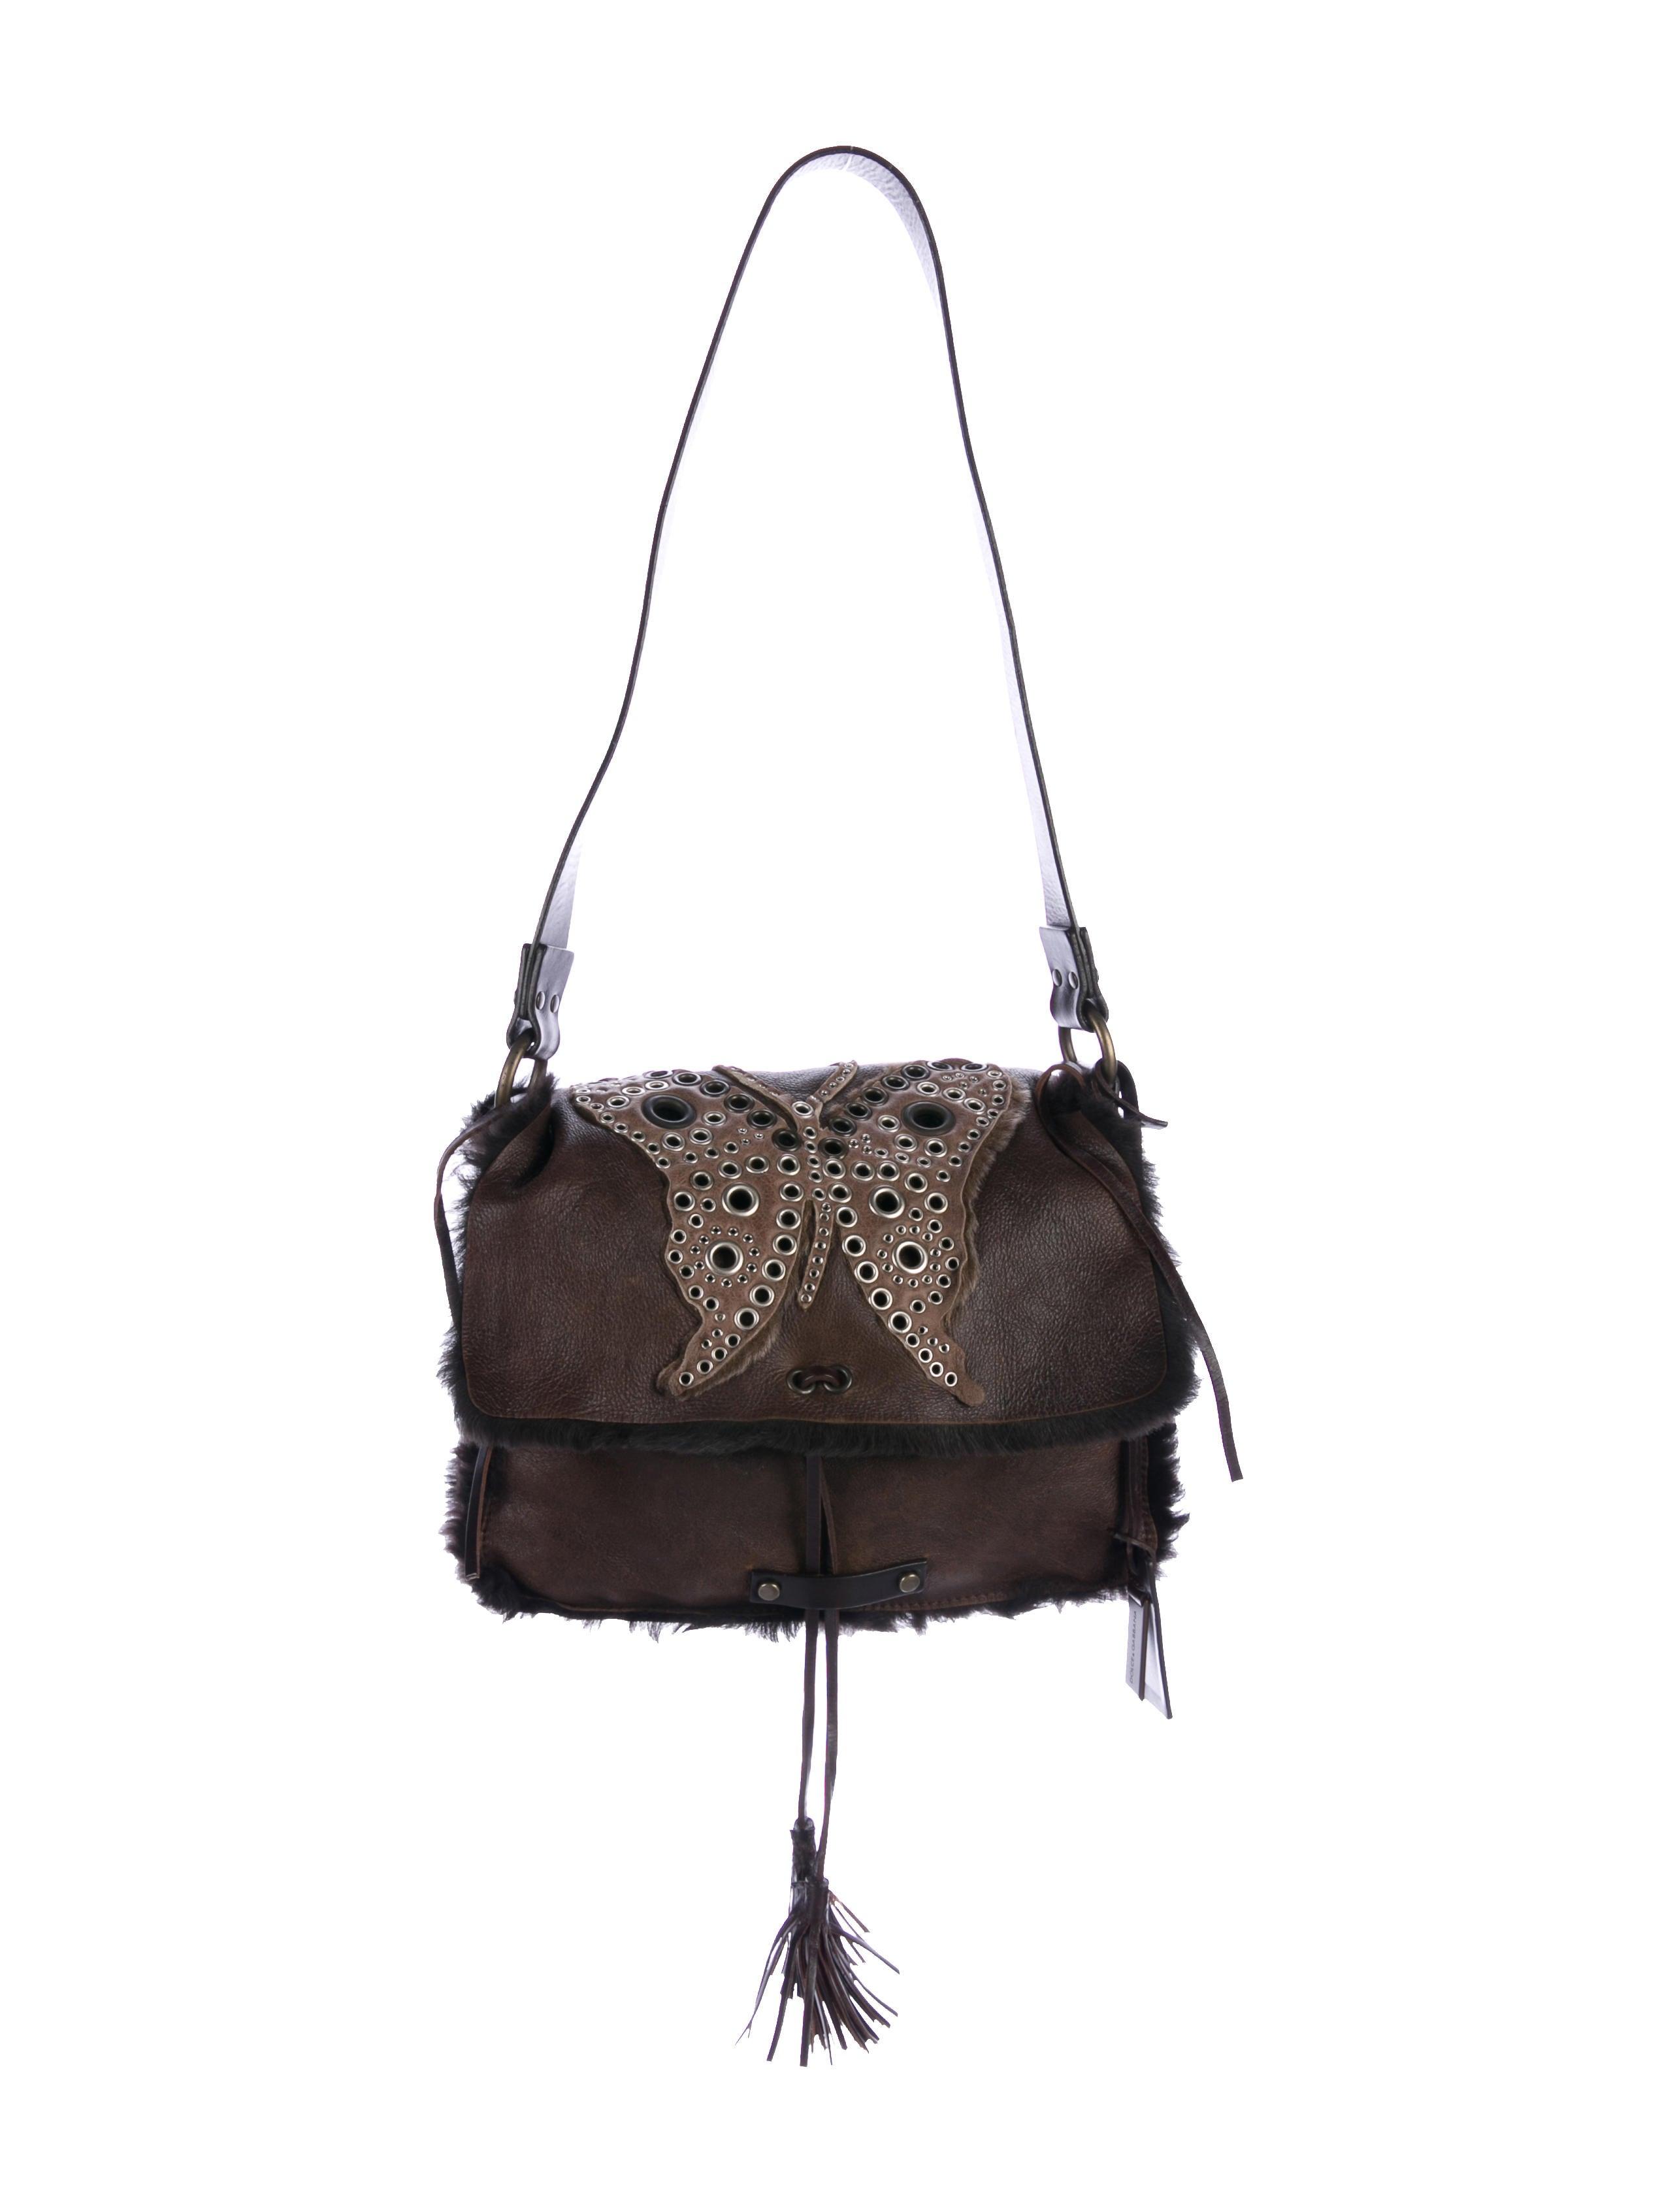 188a1d4c97 Dolce   Gabbana Shearling-Trimmed Shoulder Bag - Handbags - DAG98163 ...